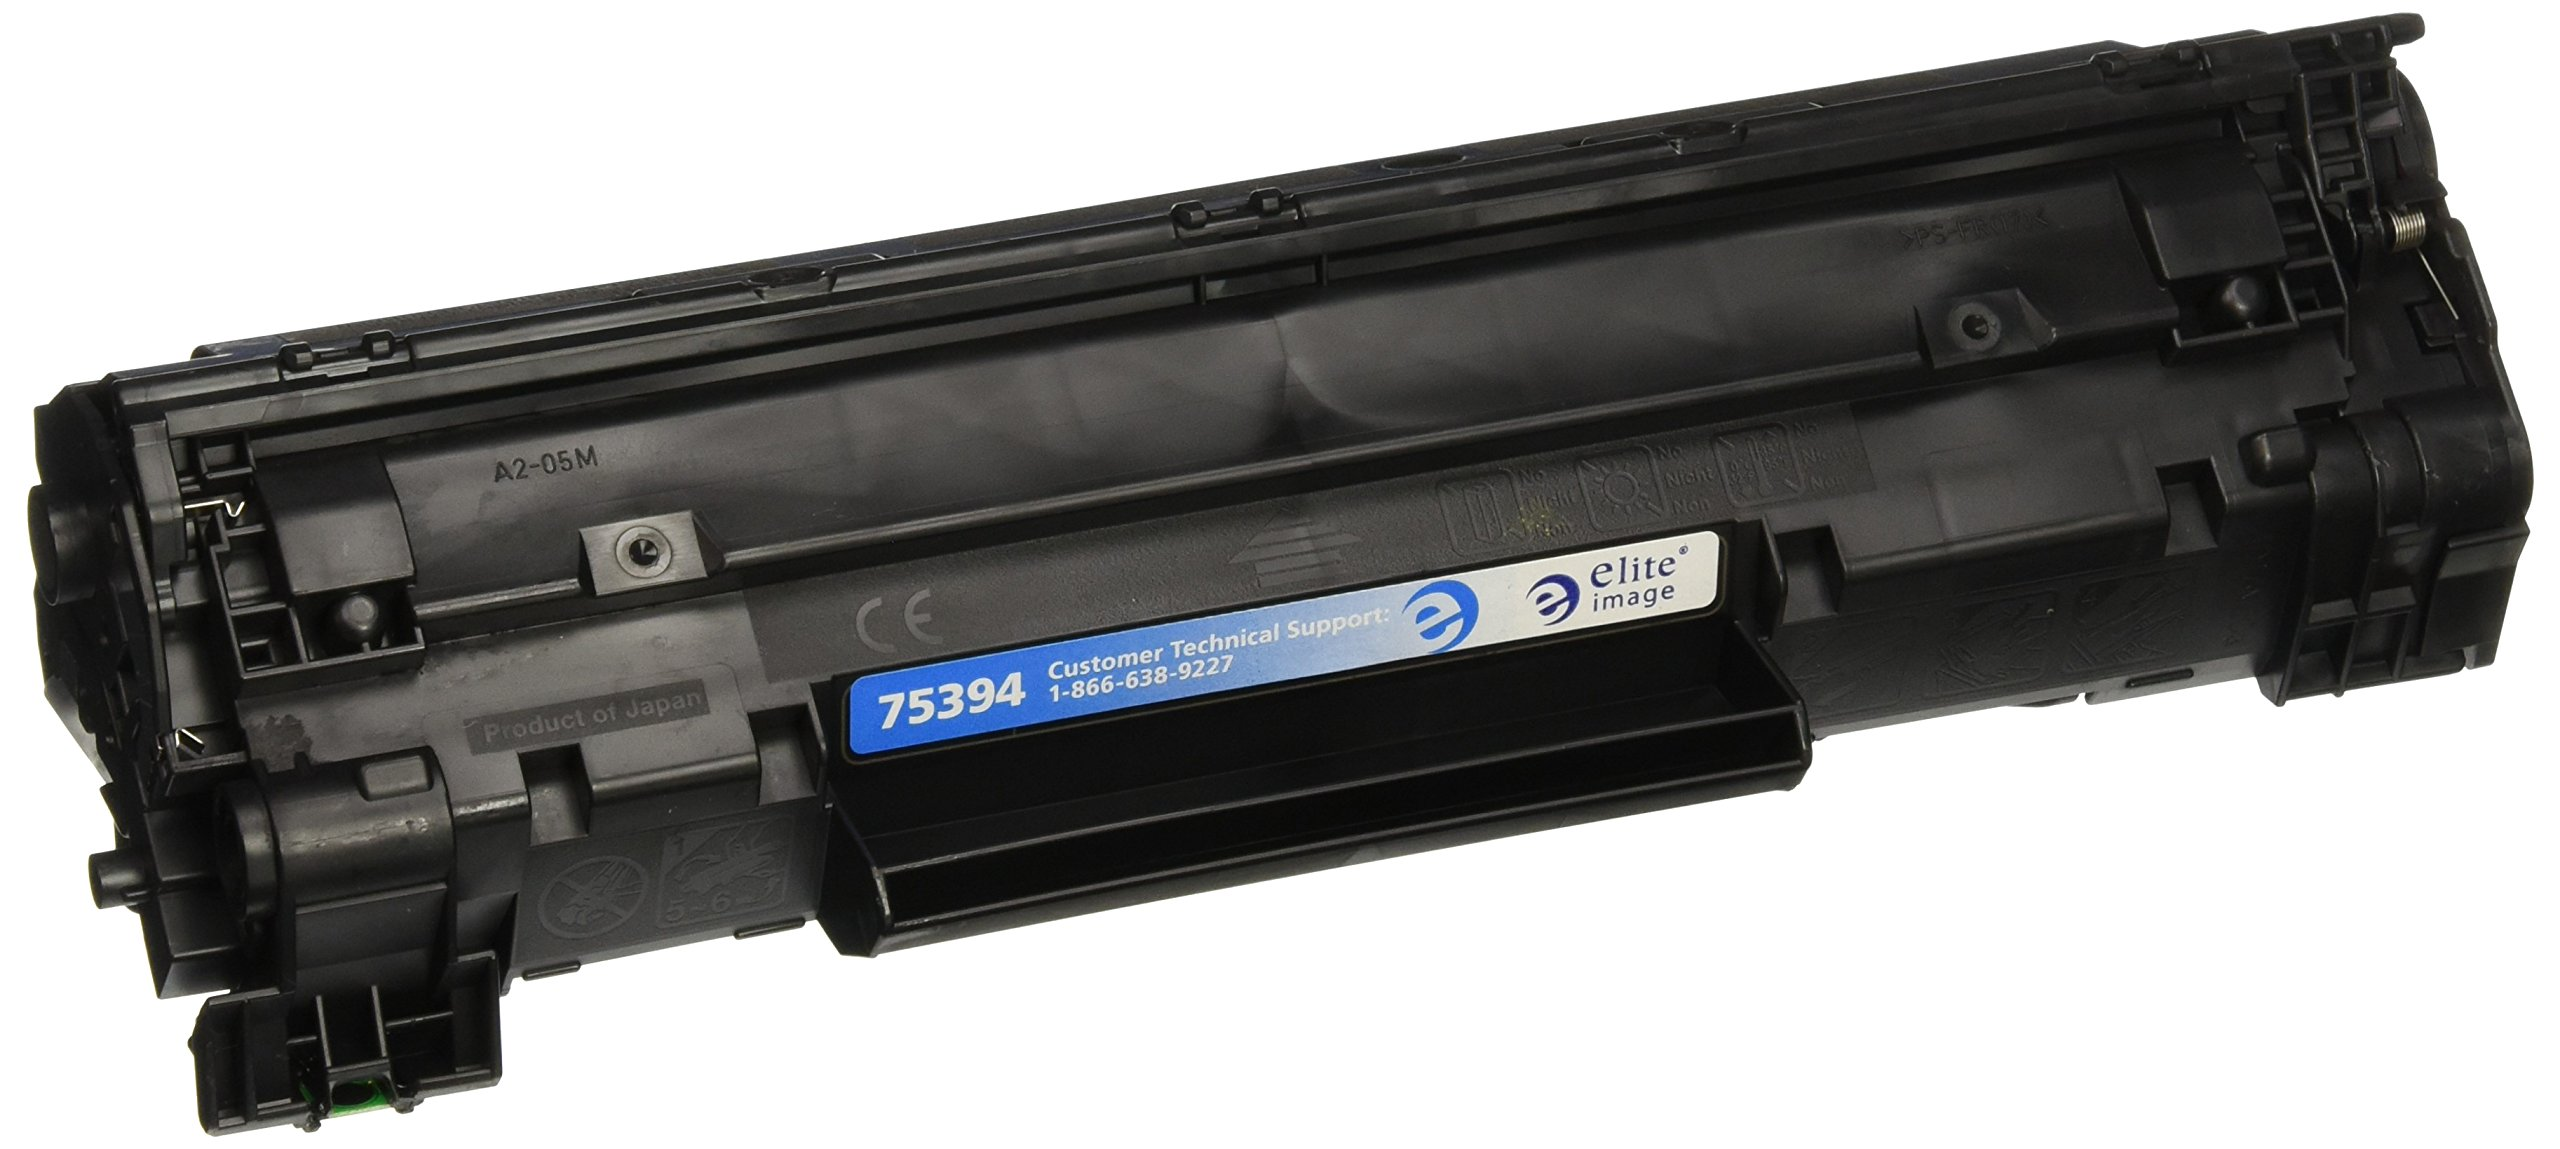 Elite Image ELI75394 Compatible Toner Replaces HP CB435A (35A), Black